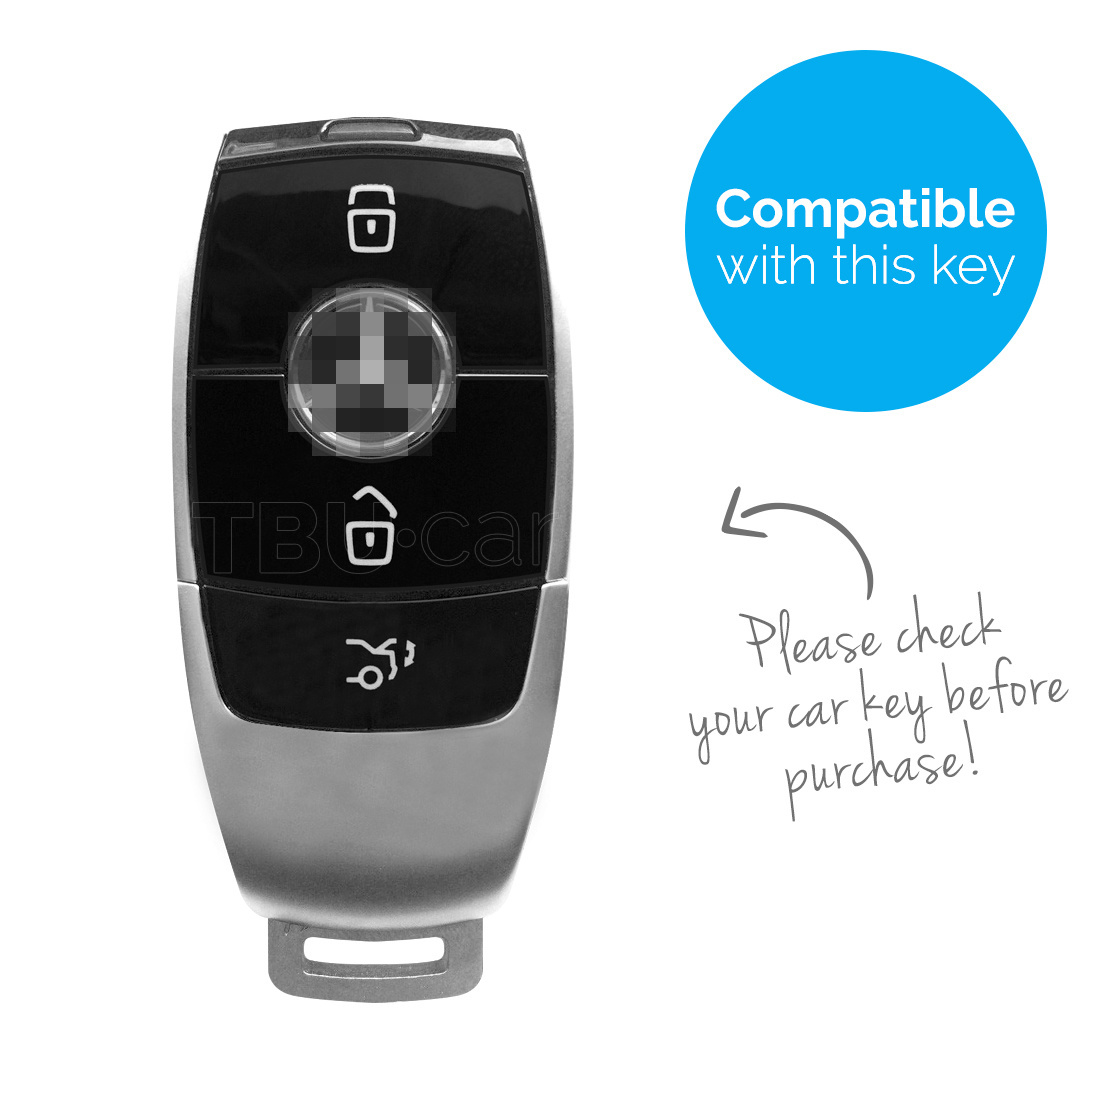 TBU car TBU car Sleutel cover compatibel met Mercedes - TPU sleutel hoesje / beschermhoesje autosleutel - Goud